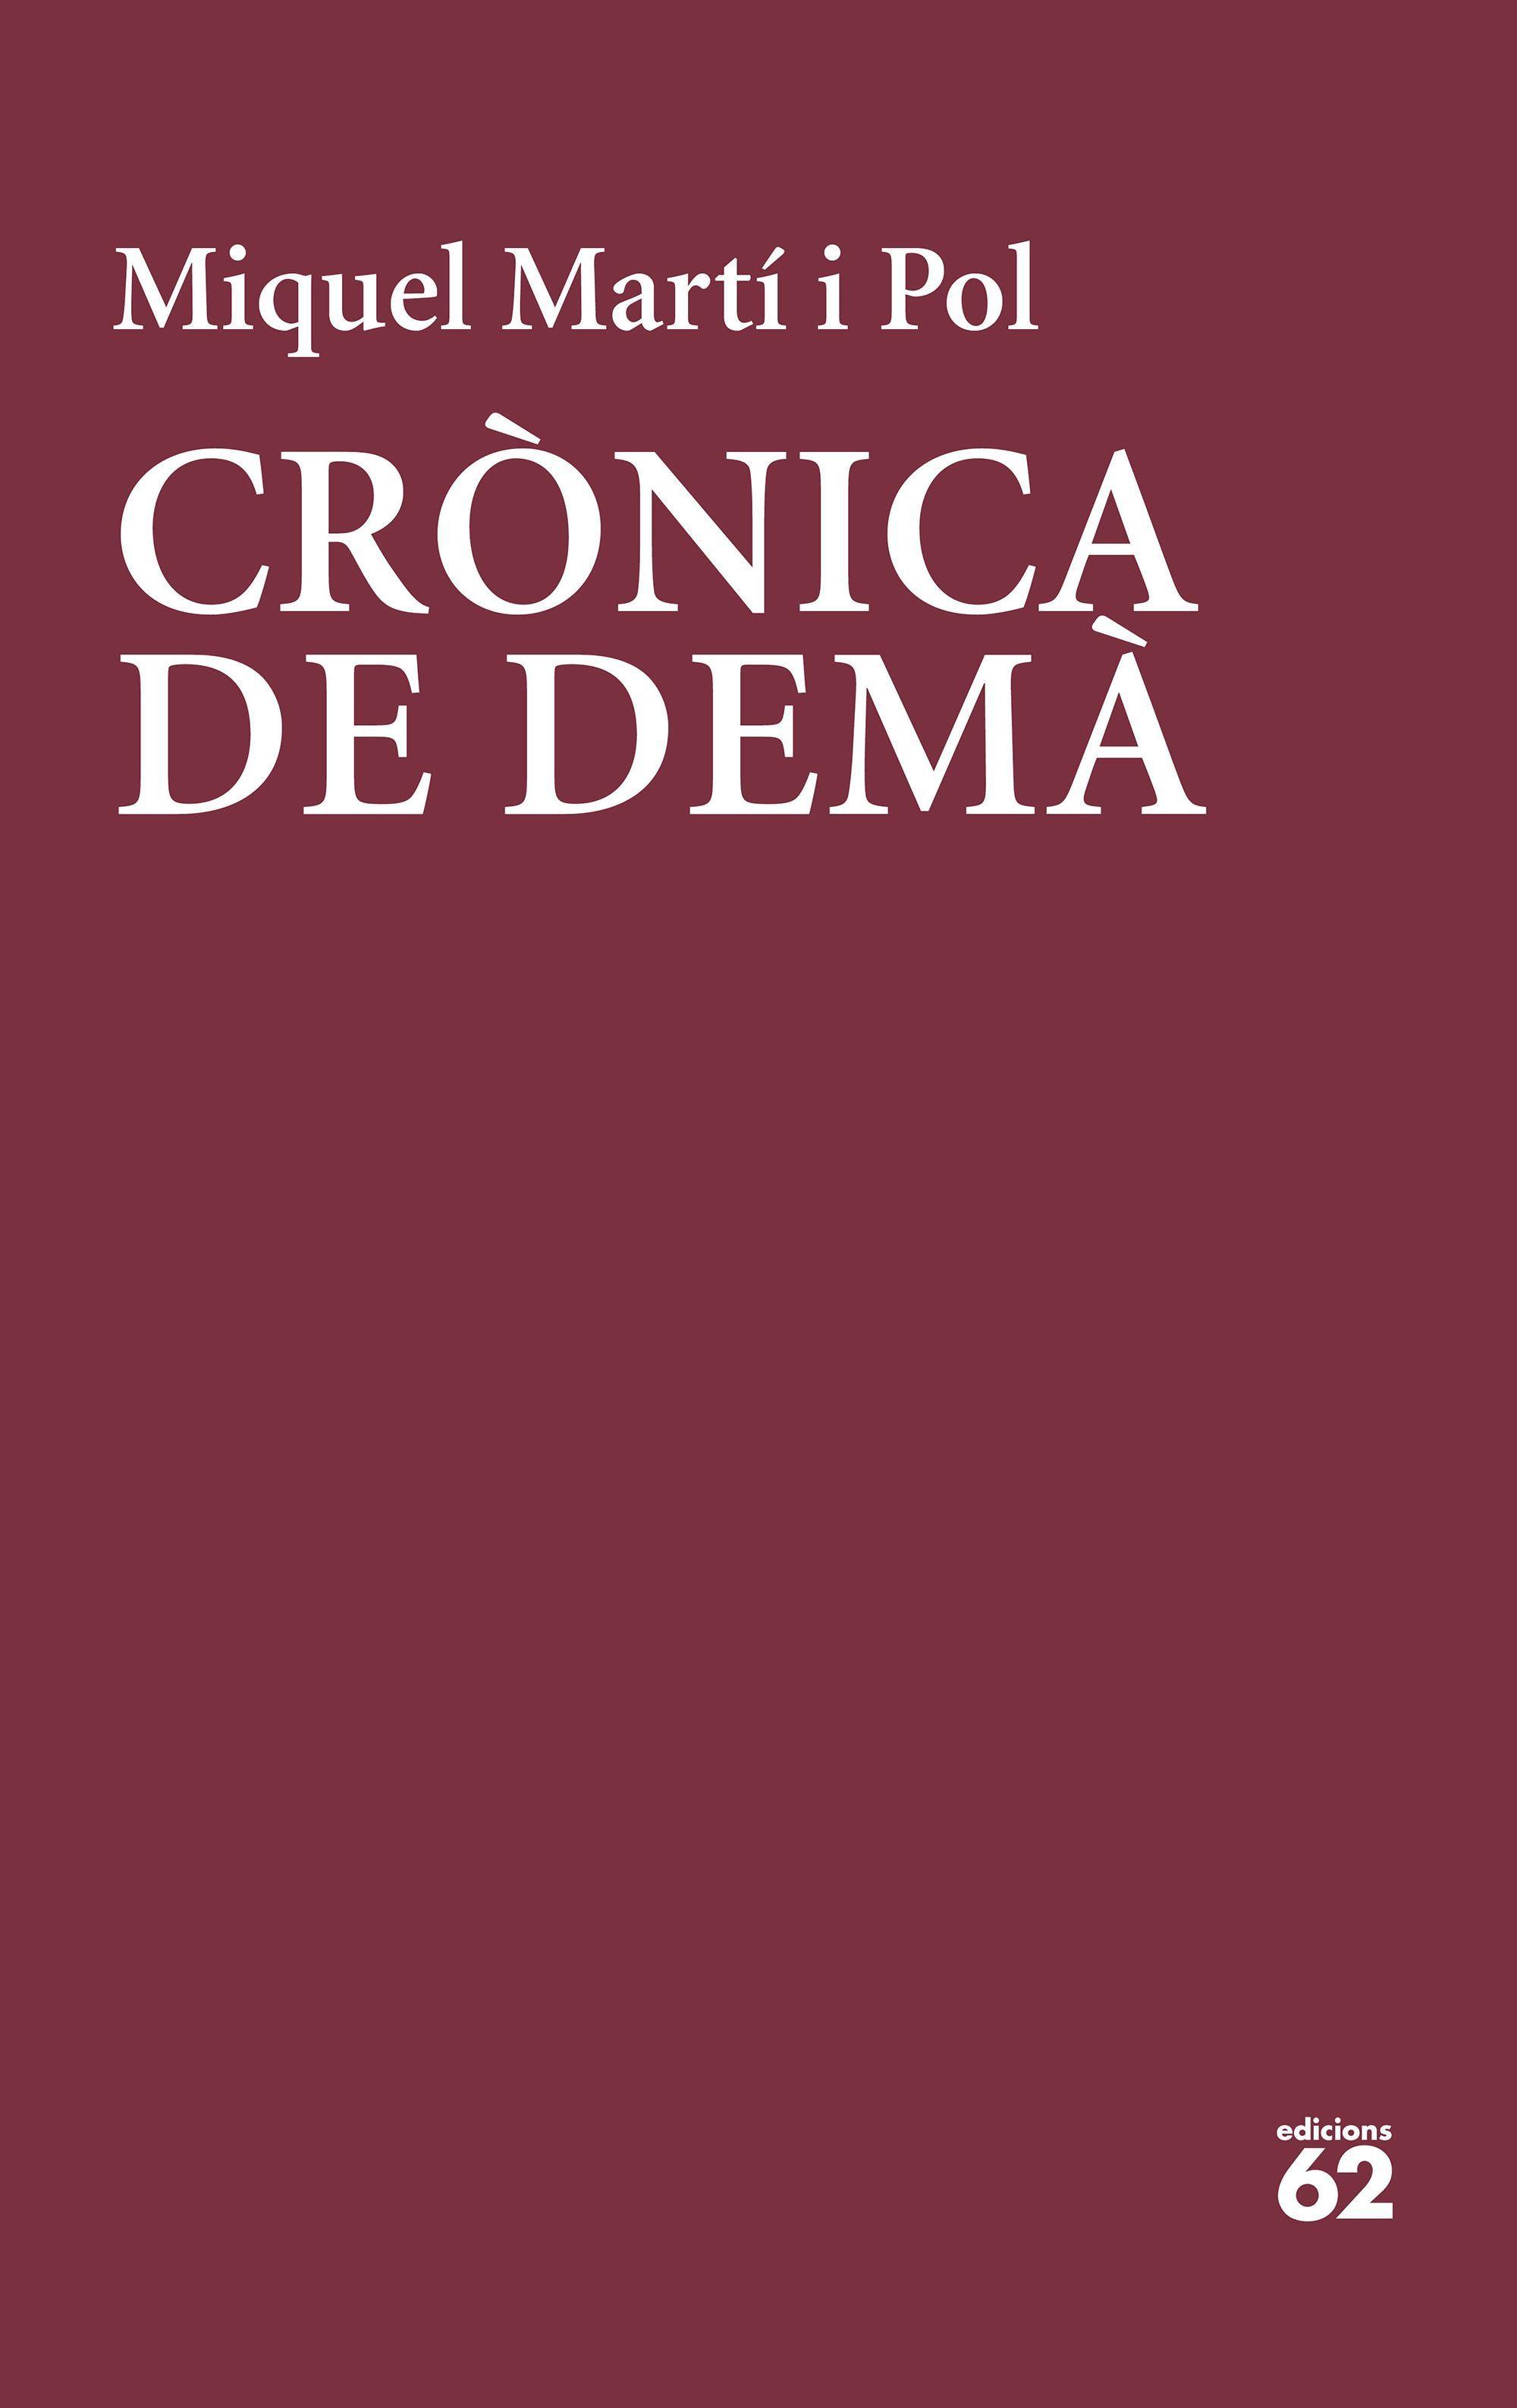 CRONICA DE DEMA